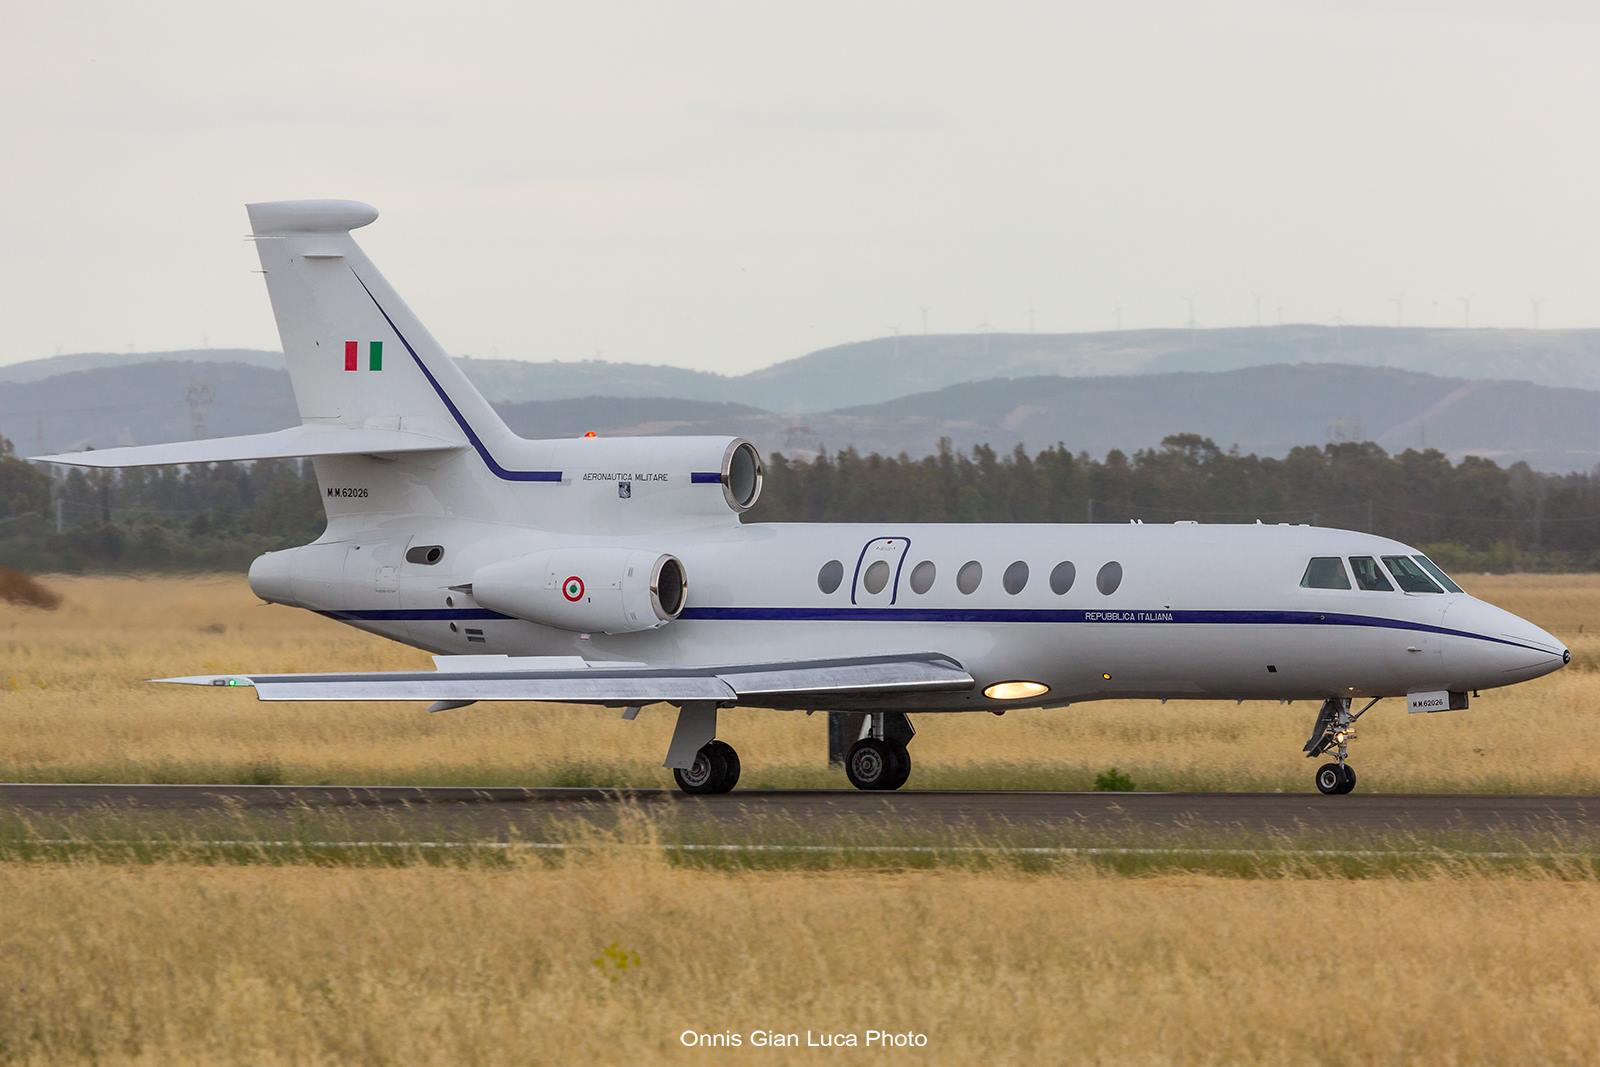 Falcon 900 del 93° Gruppo Volo - Ph. Onnis Gian Luca